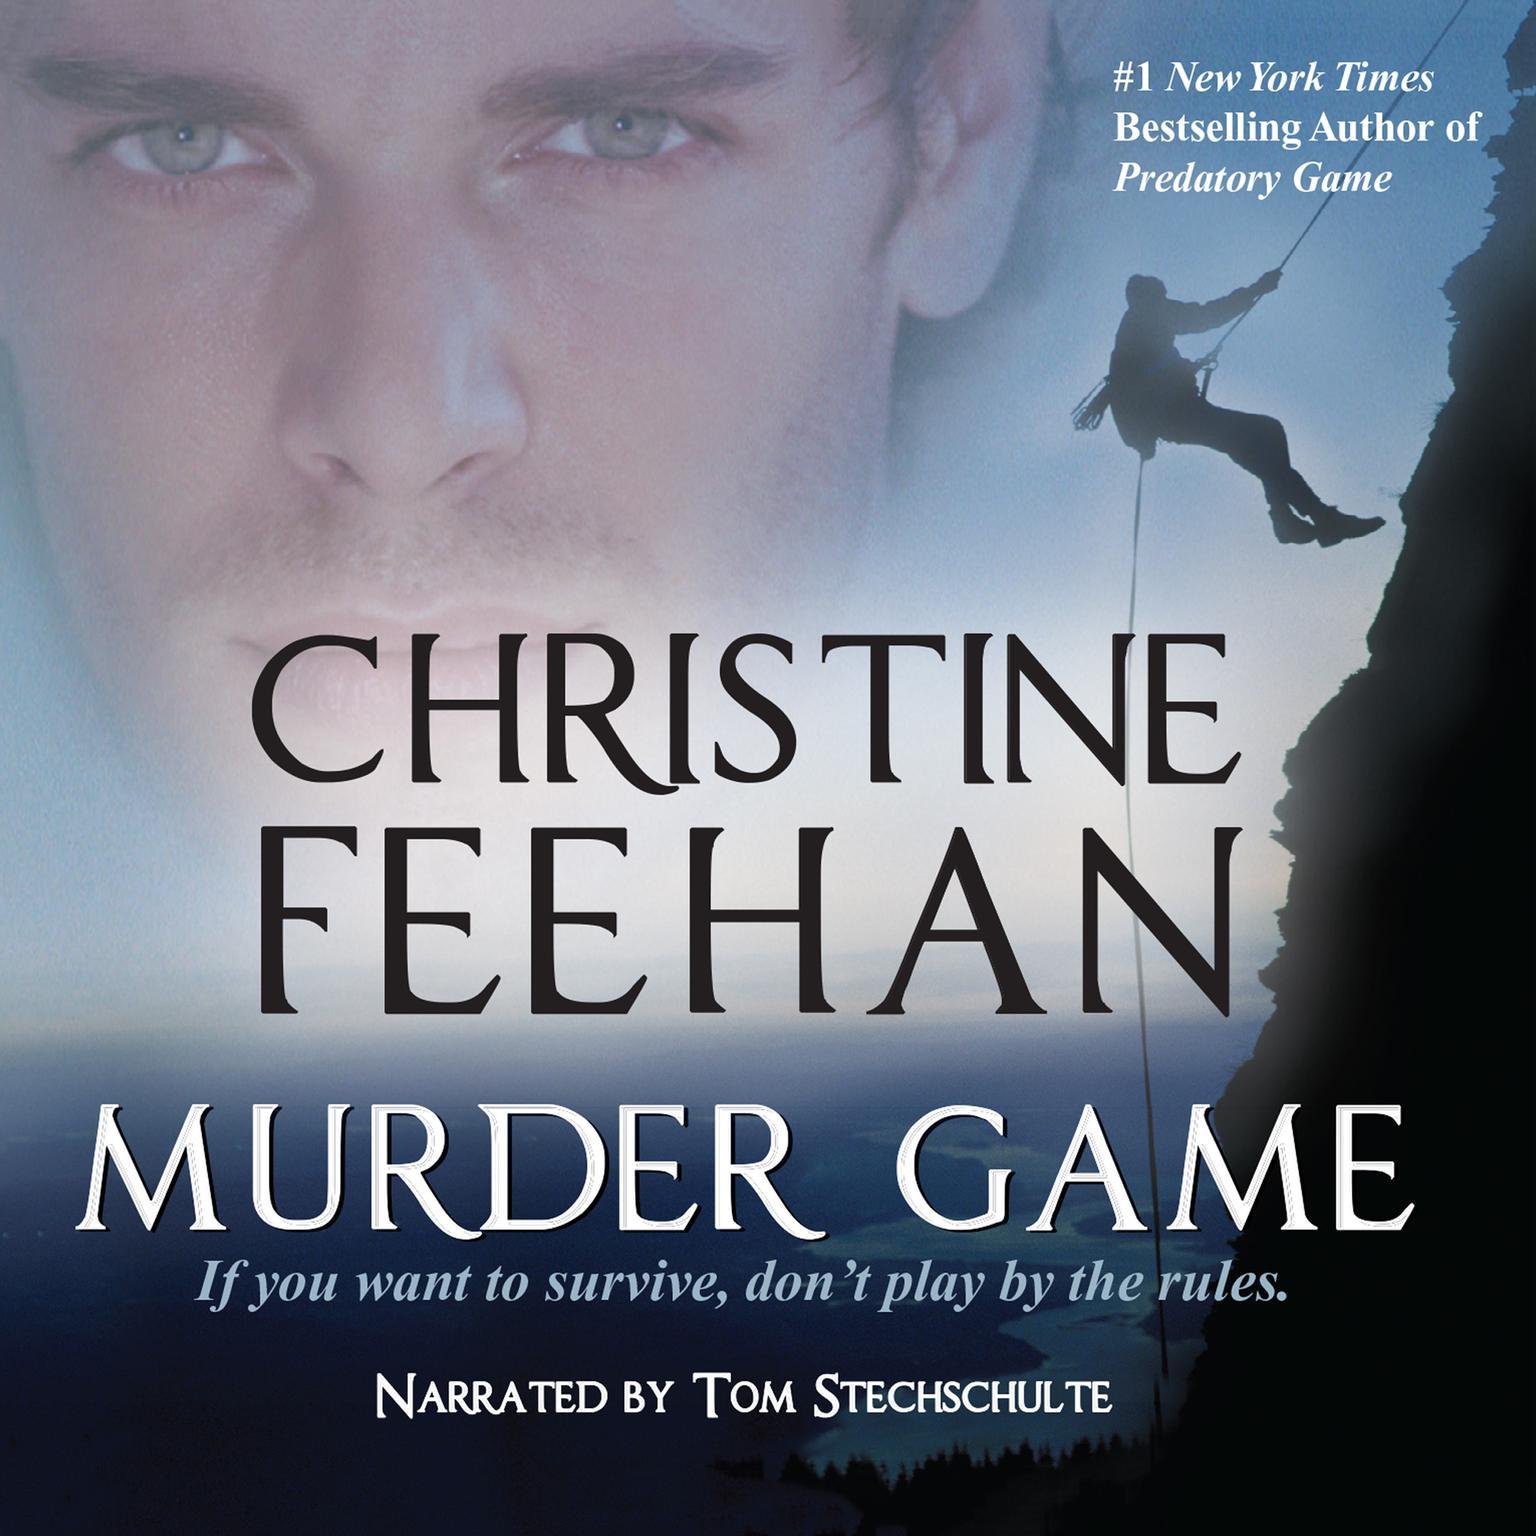 Murder Game Audiobook, by Christine Feehan